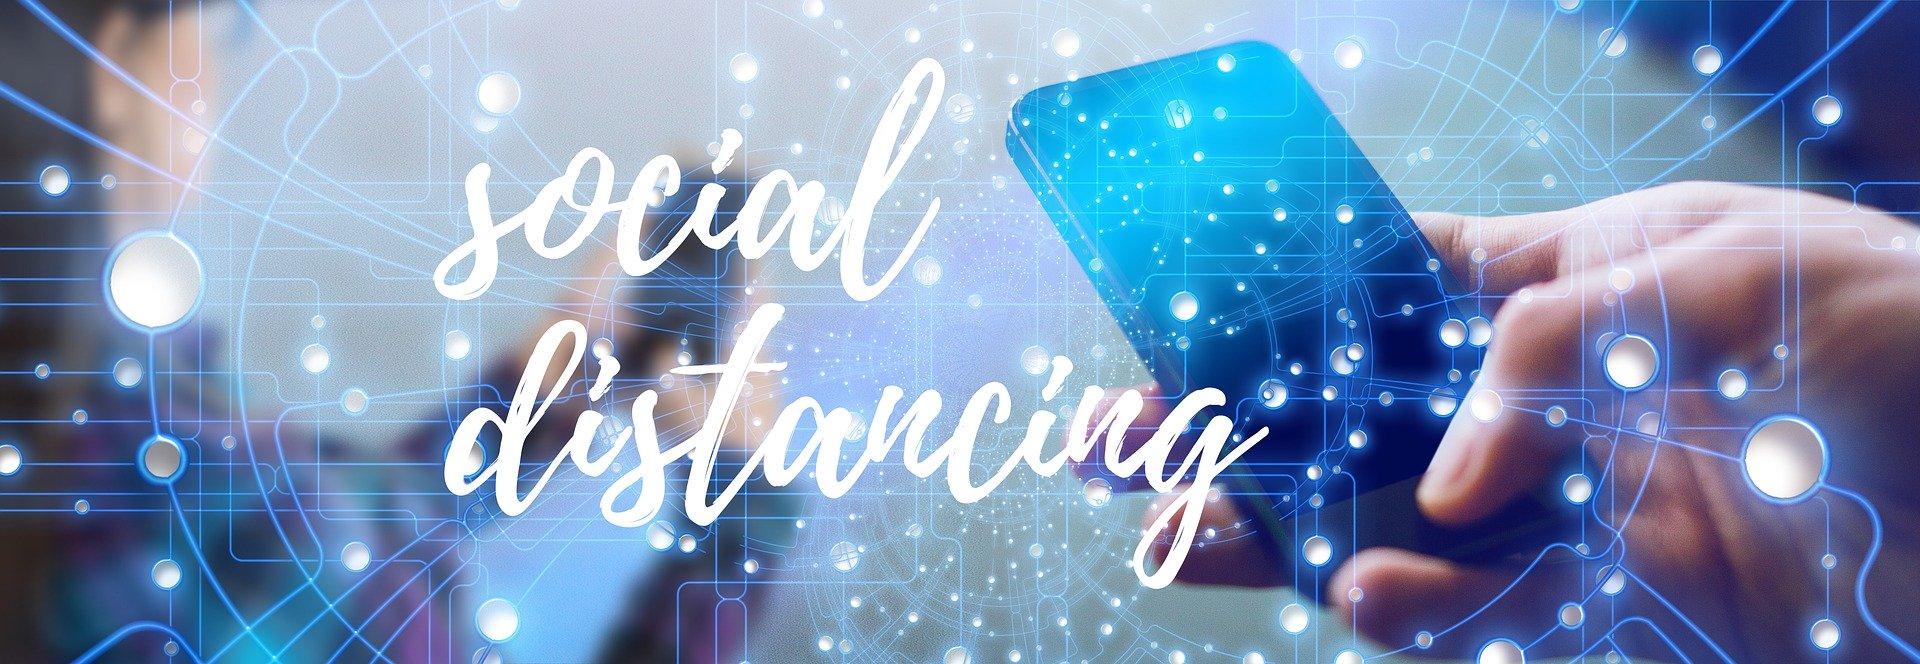 covid-19-social distancing